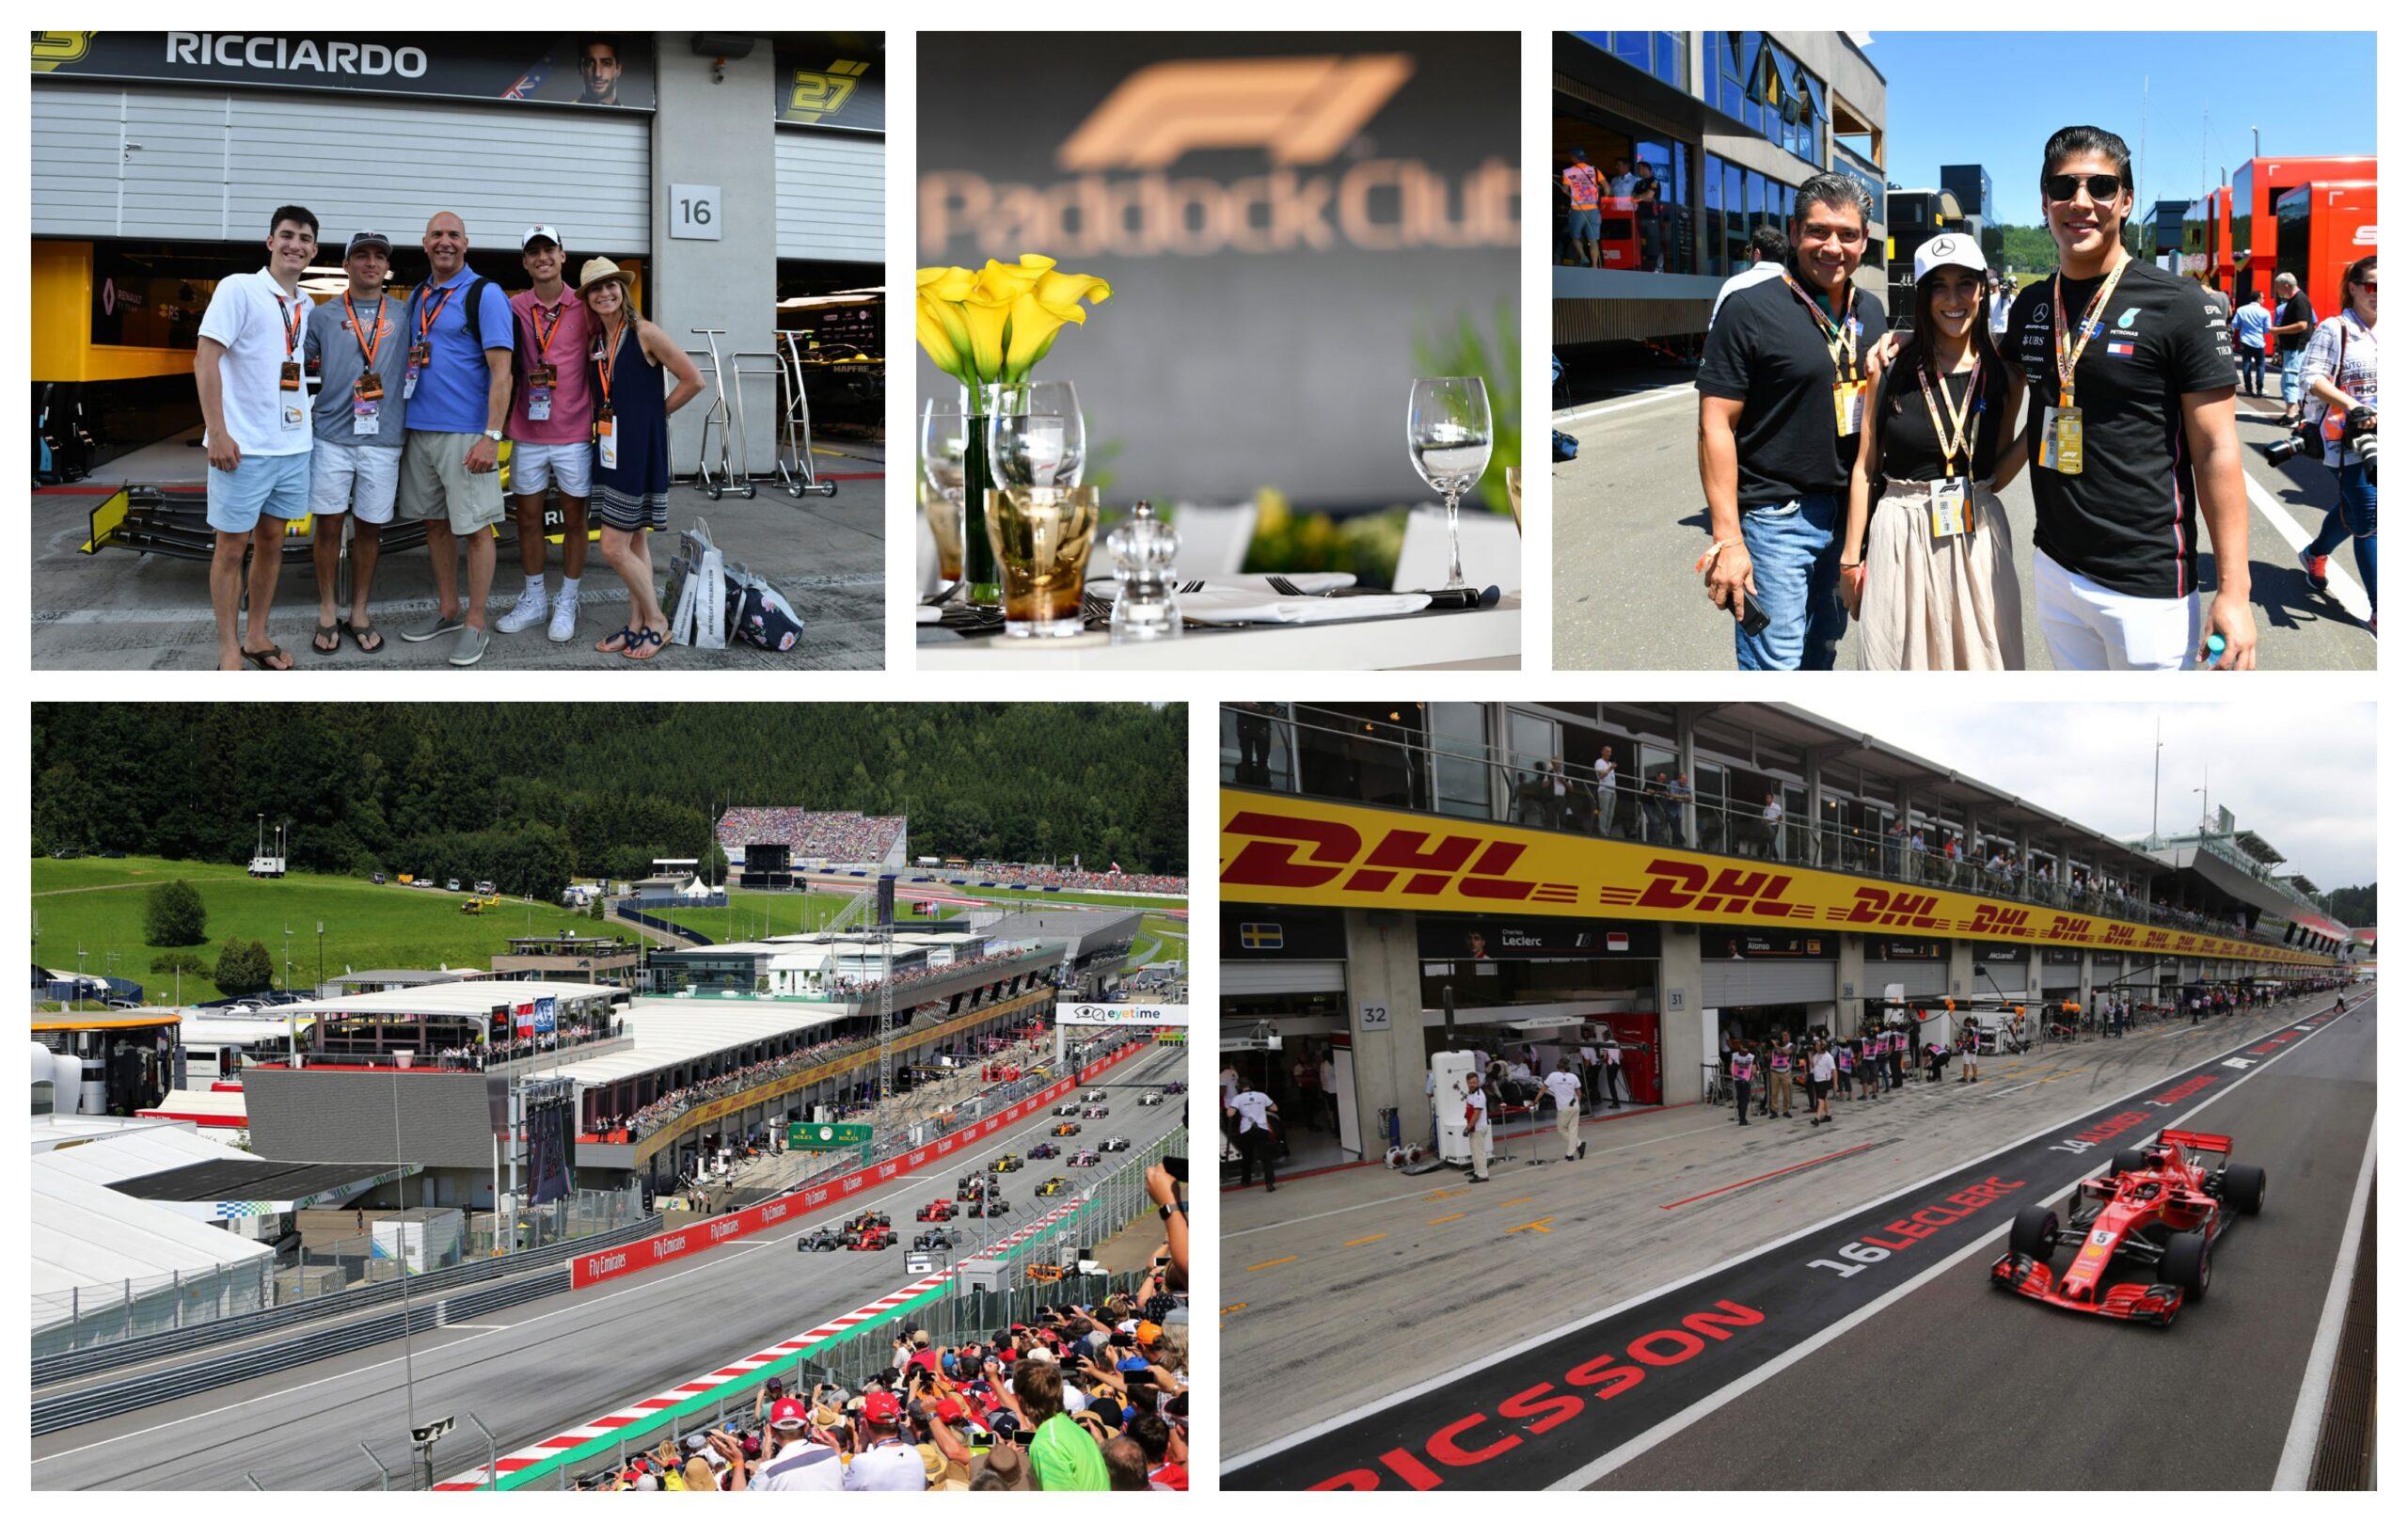 Formule 1 Oostenrijk 2021 – Paddock Club ™ –  F1® Experiences